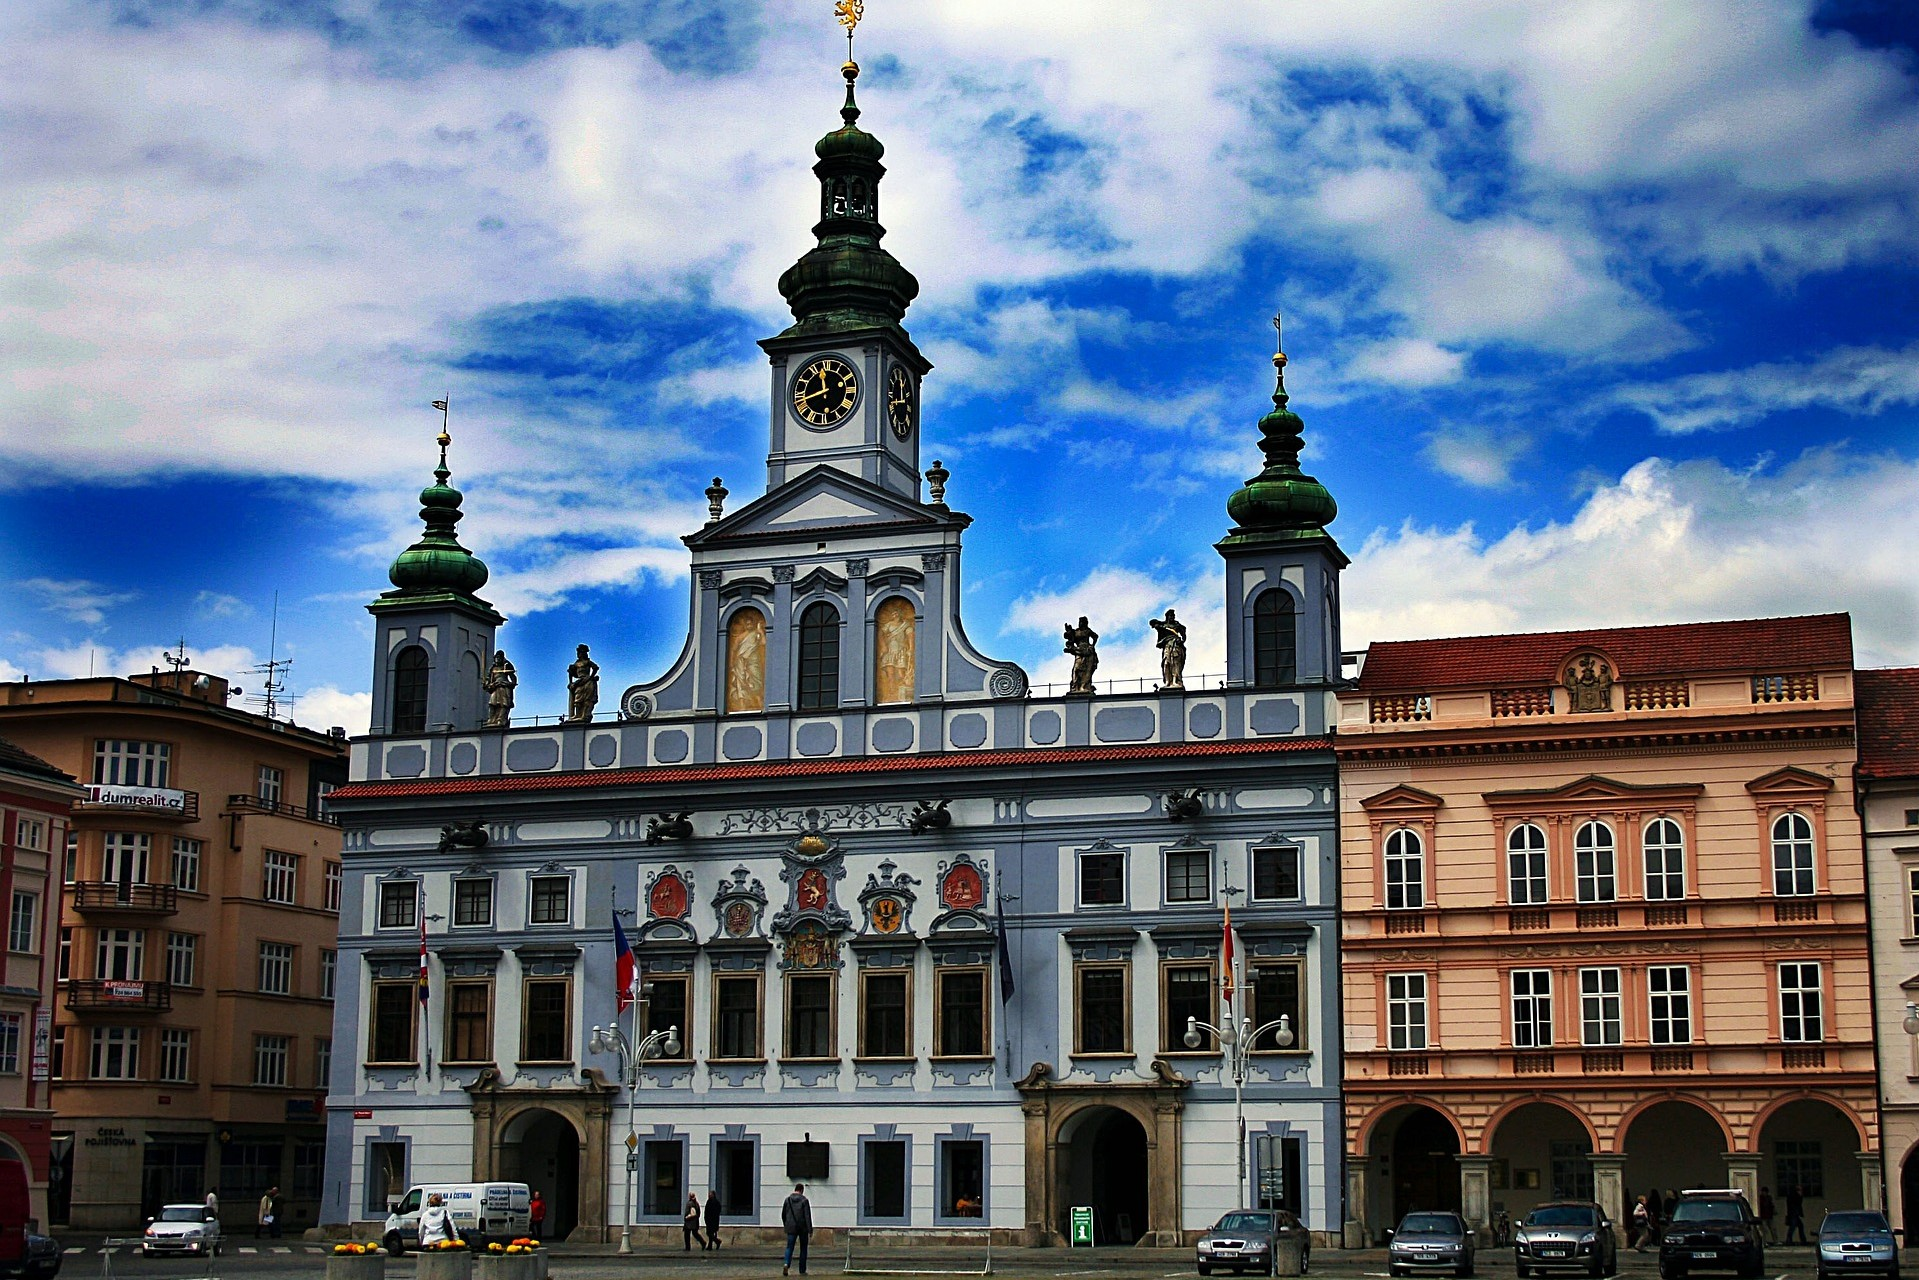 Beautiful facades line the České Budějovice main square.